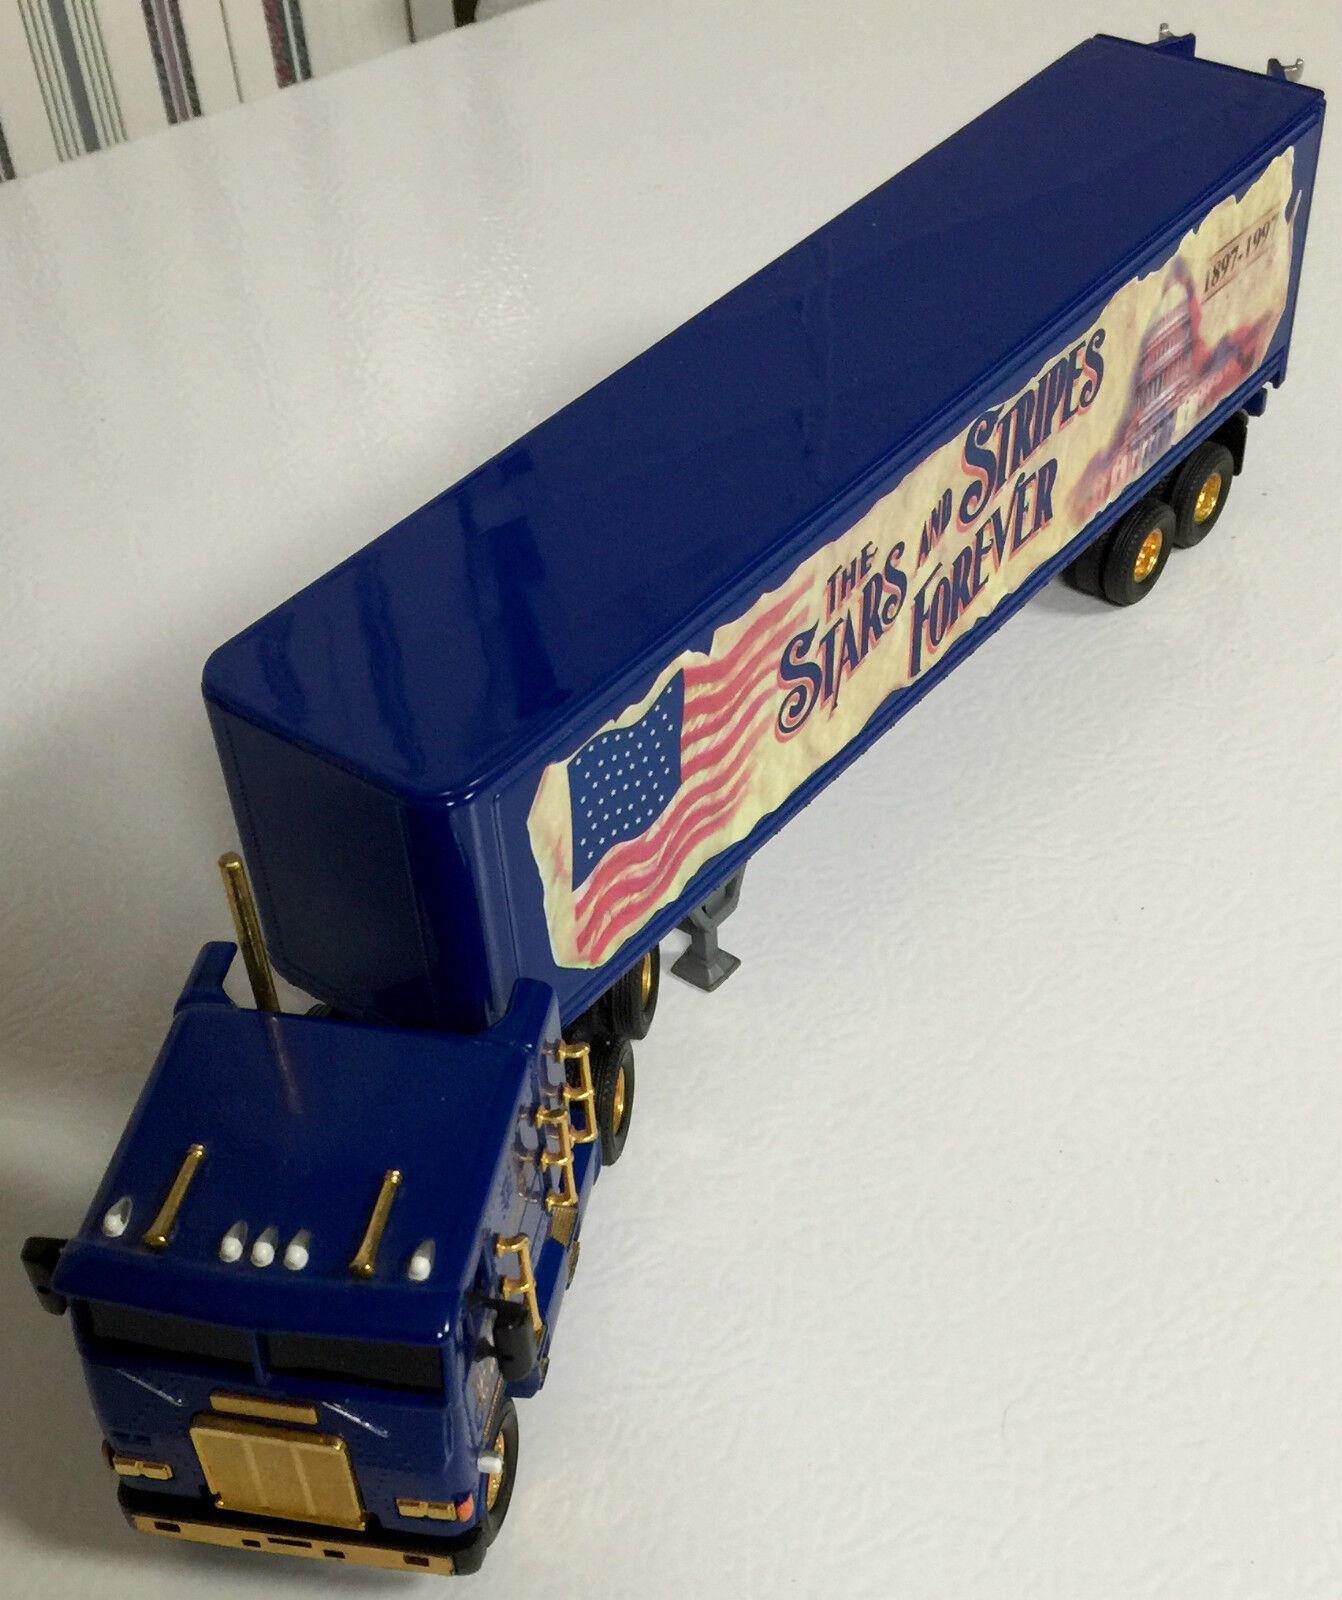 Matchbox Stars and Stripes Forever Freightliner C.O.E. Centennial 1897-1997 1 58